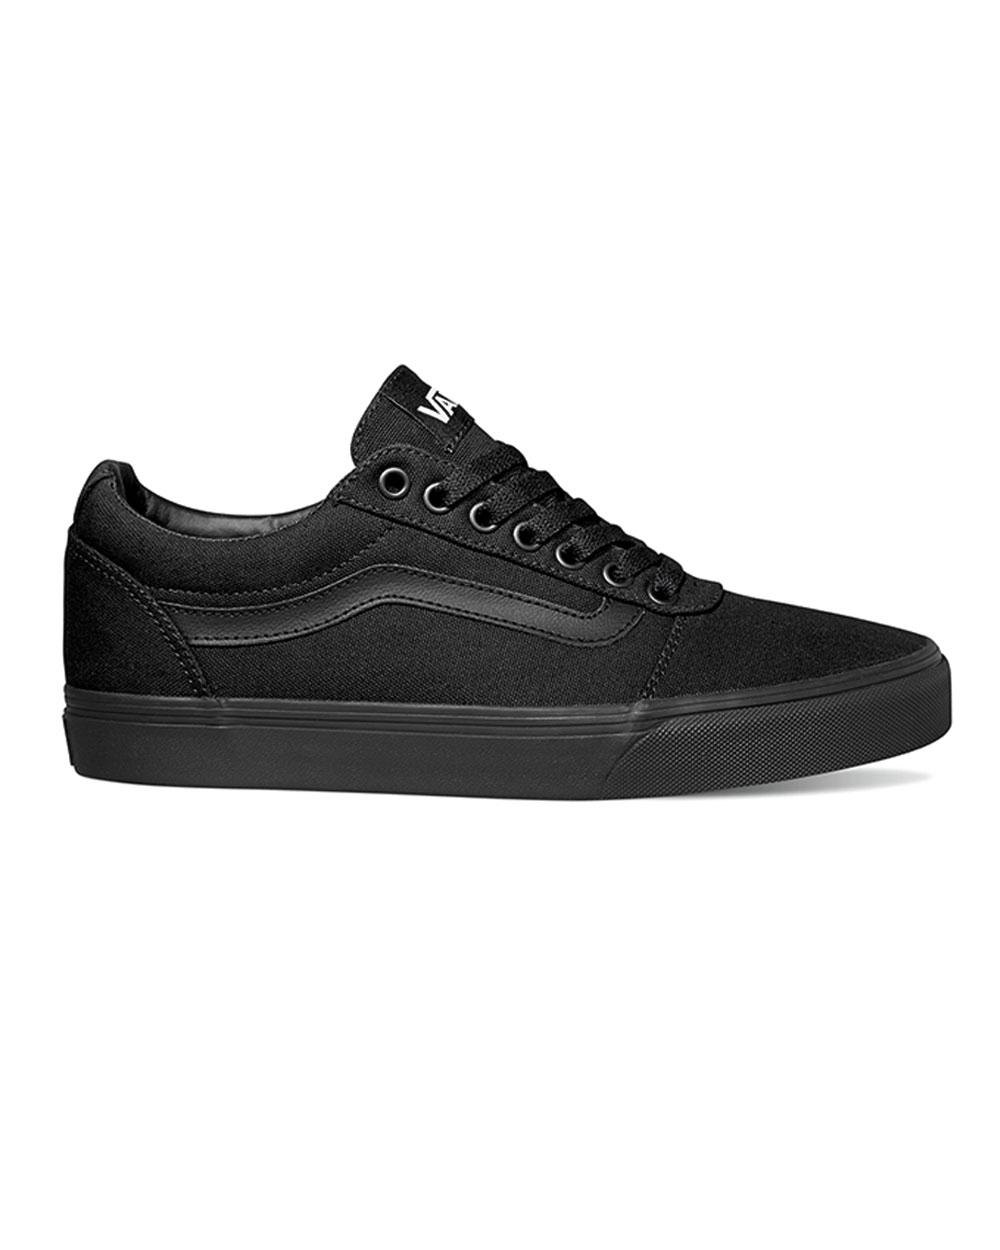 Vans Canvas Ward (black/black) | Extra